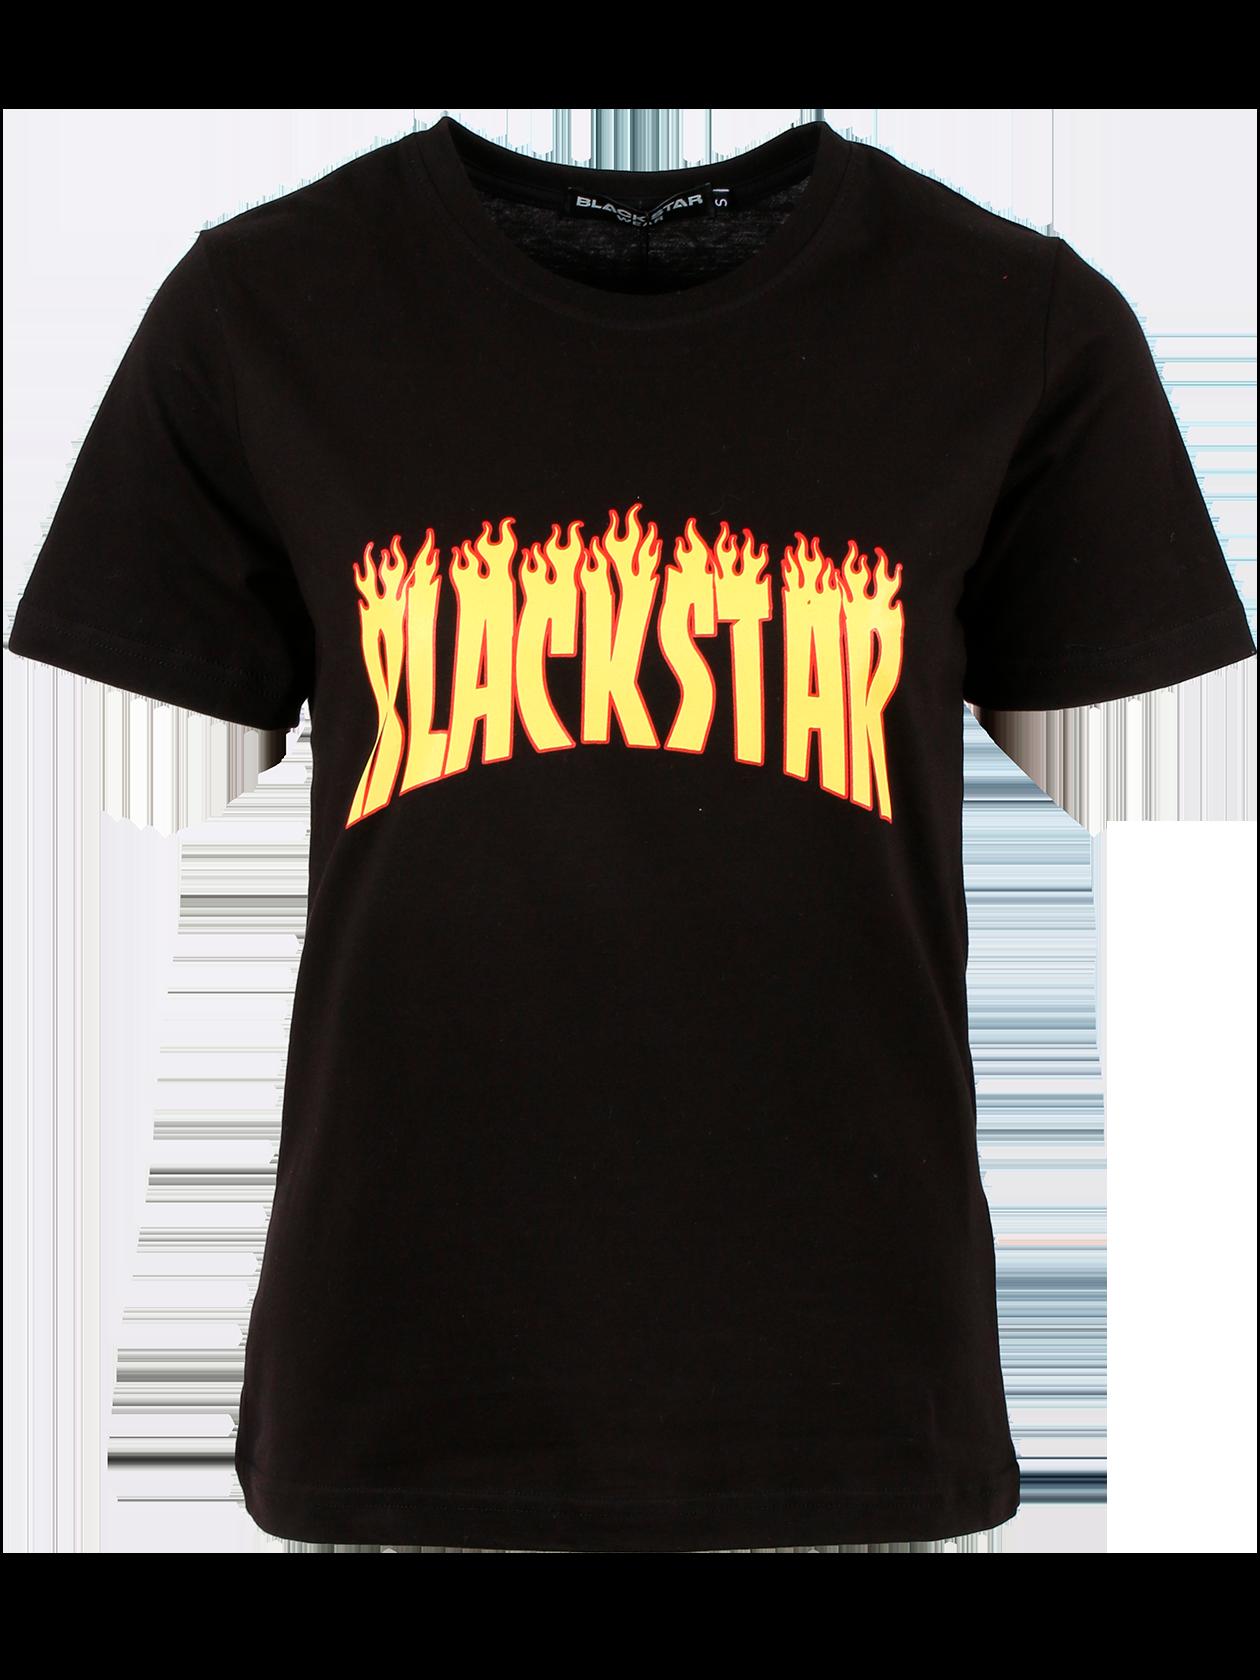 Womens t-shirt FIREWOMAN<br><br>size: L<br>color: Black<br>gender: female